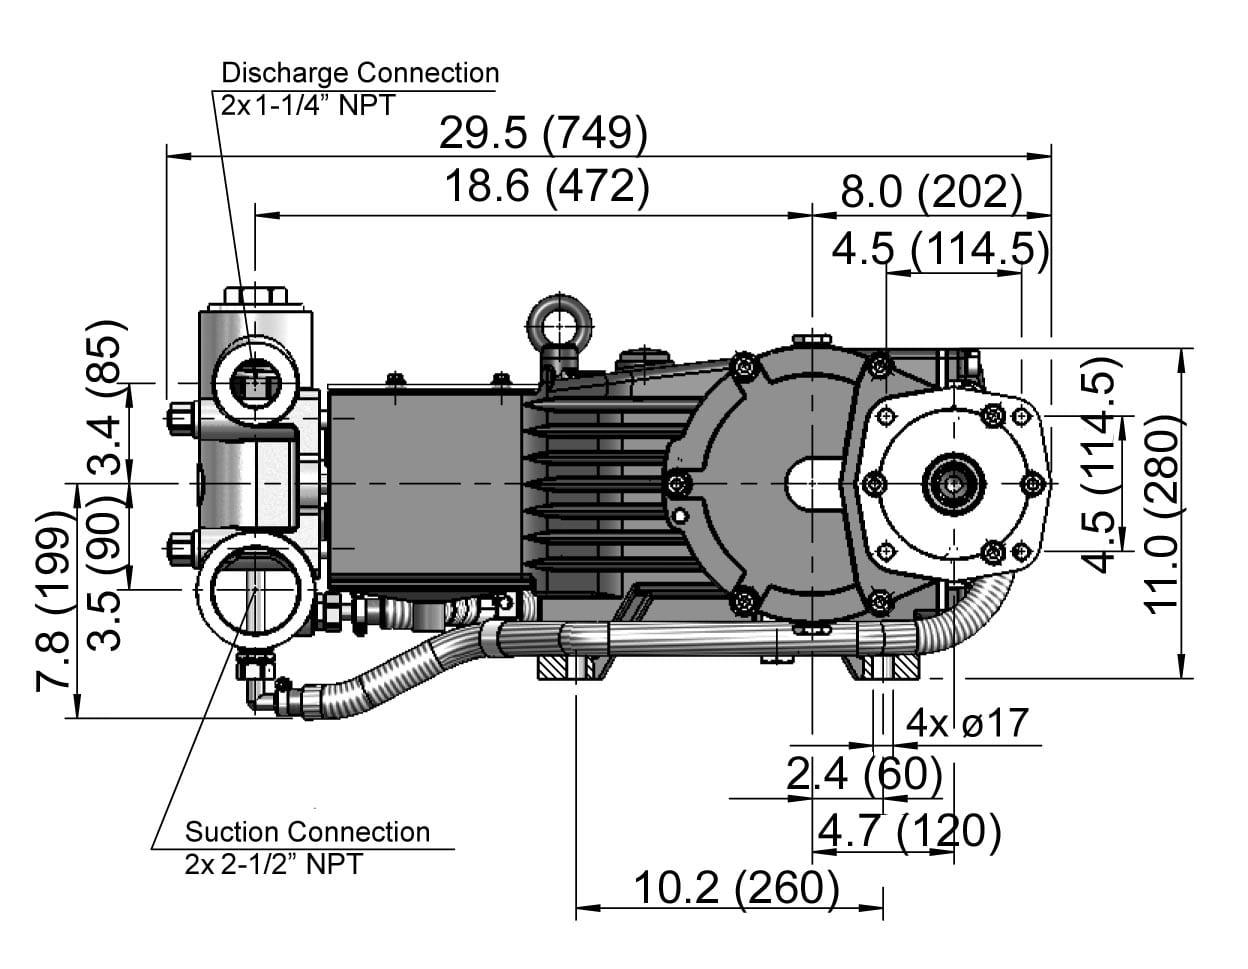 vertical briggs and stratton vanguard wiring diagram 73 Super Beetle Wiring Diagram Auto Wiring Diagram Symbols